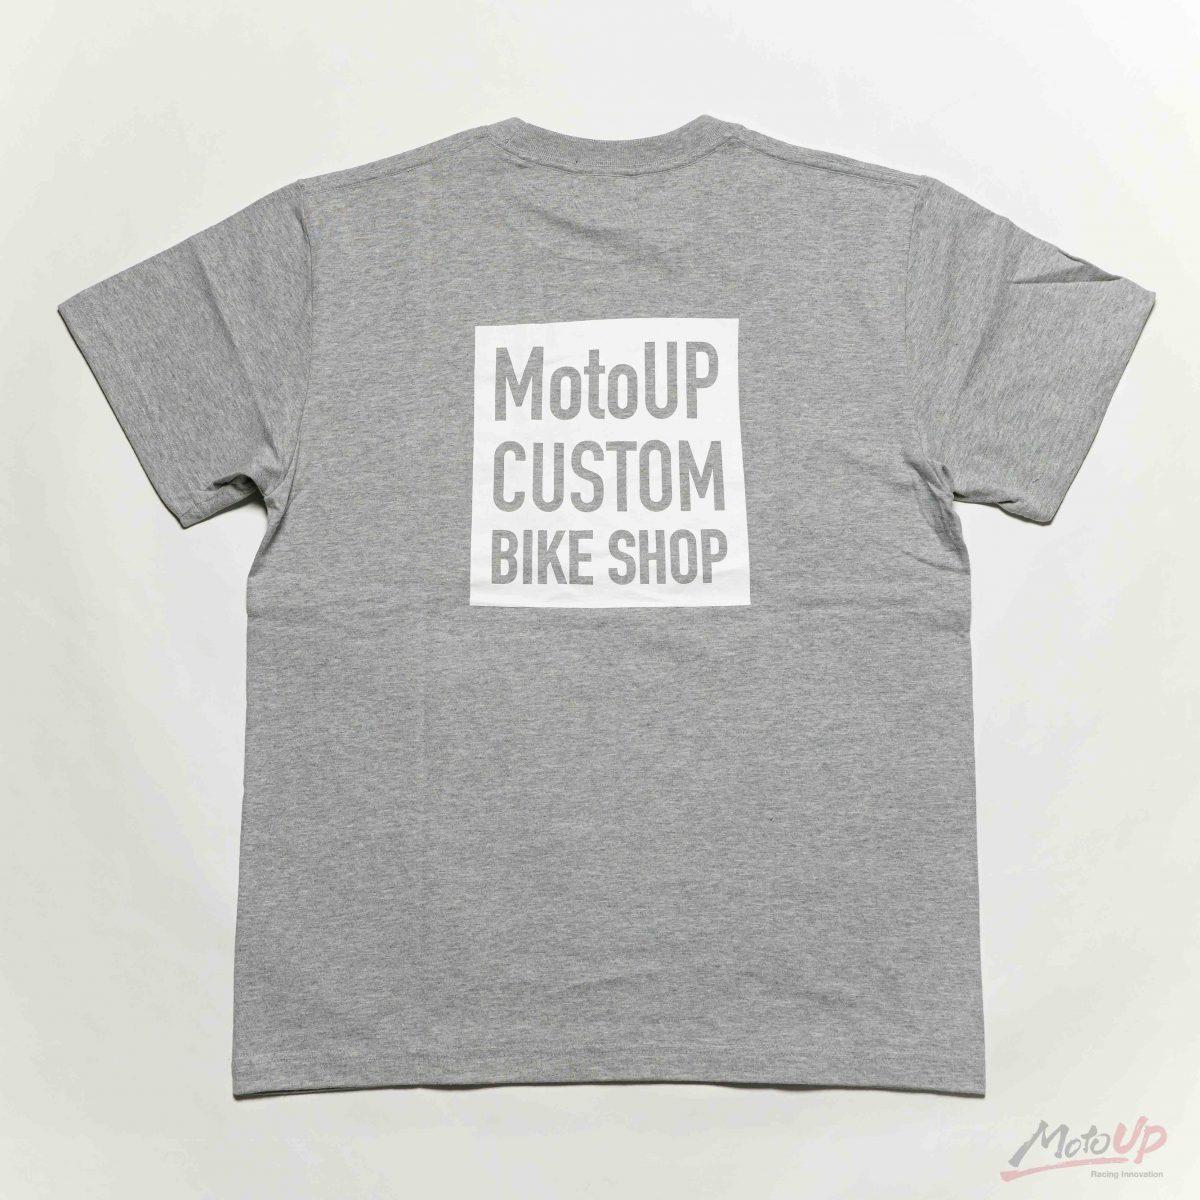 「CUSTOM BIKE SHOP」S/S Cotton Pocket Print T-shirt